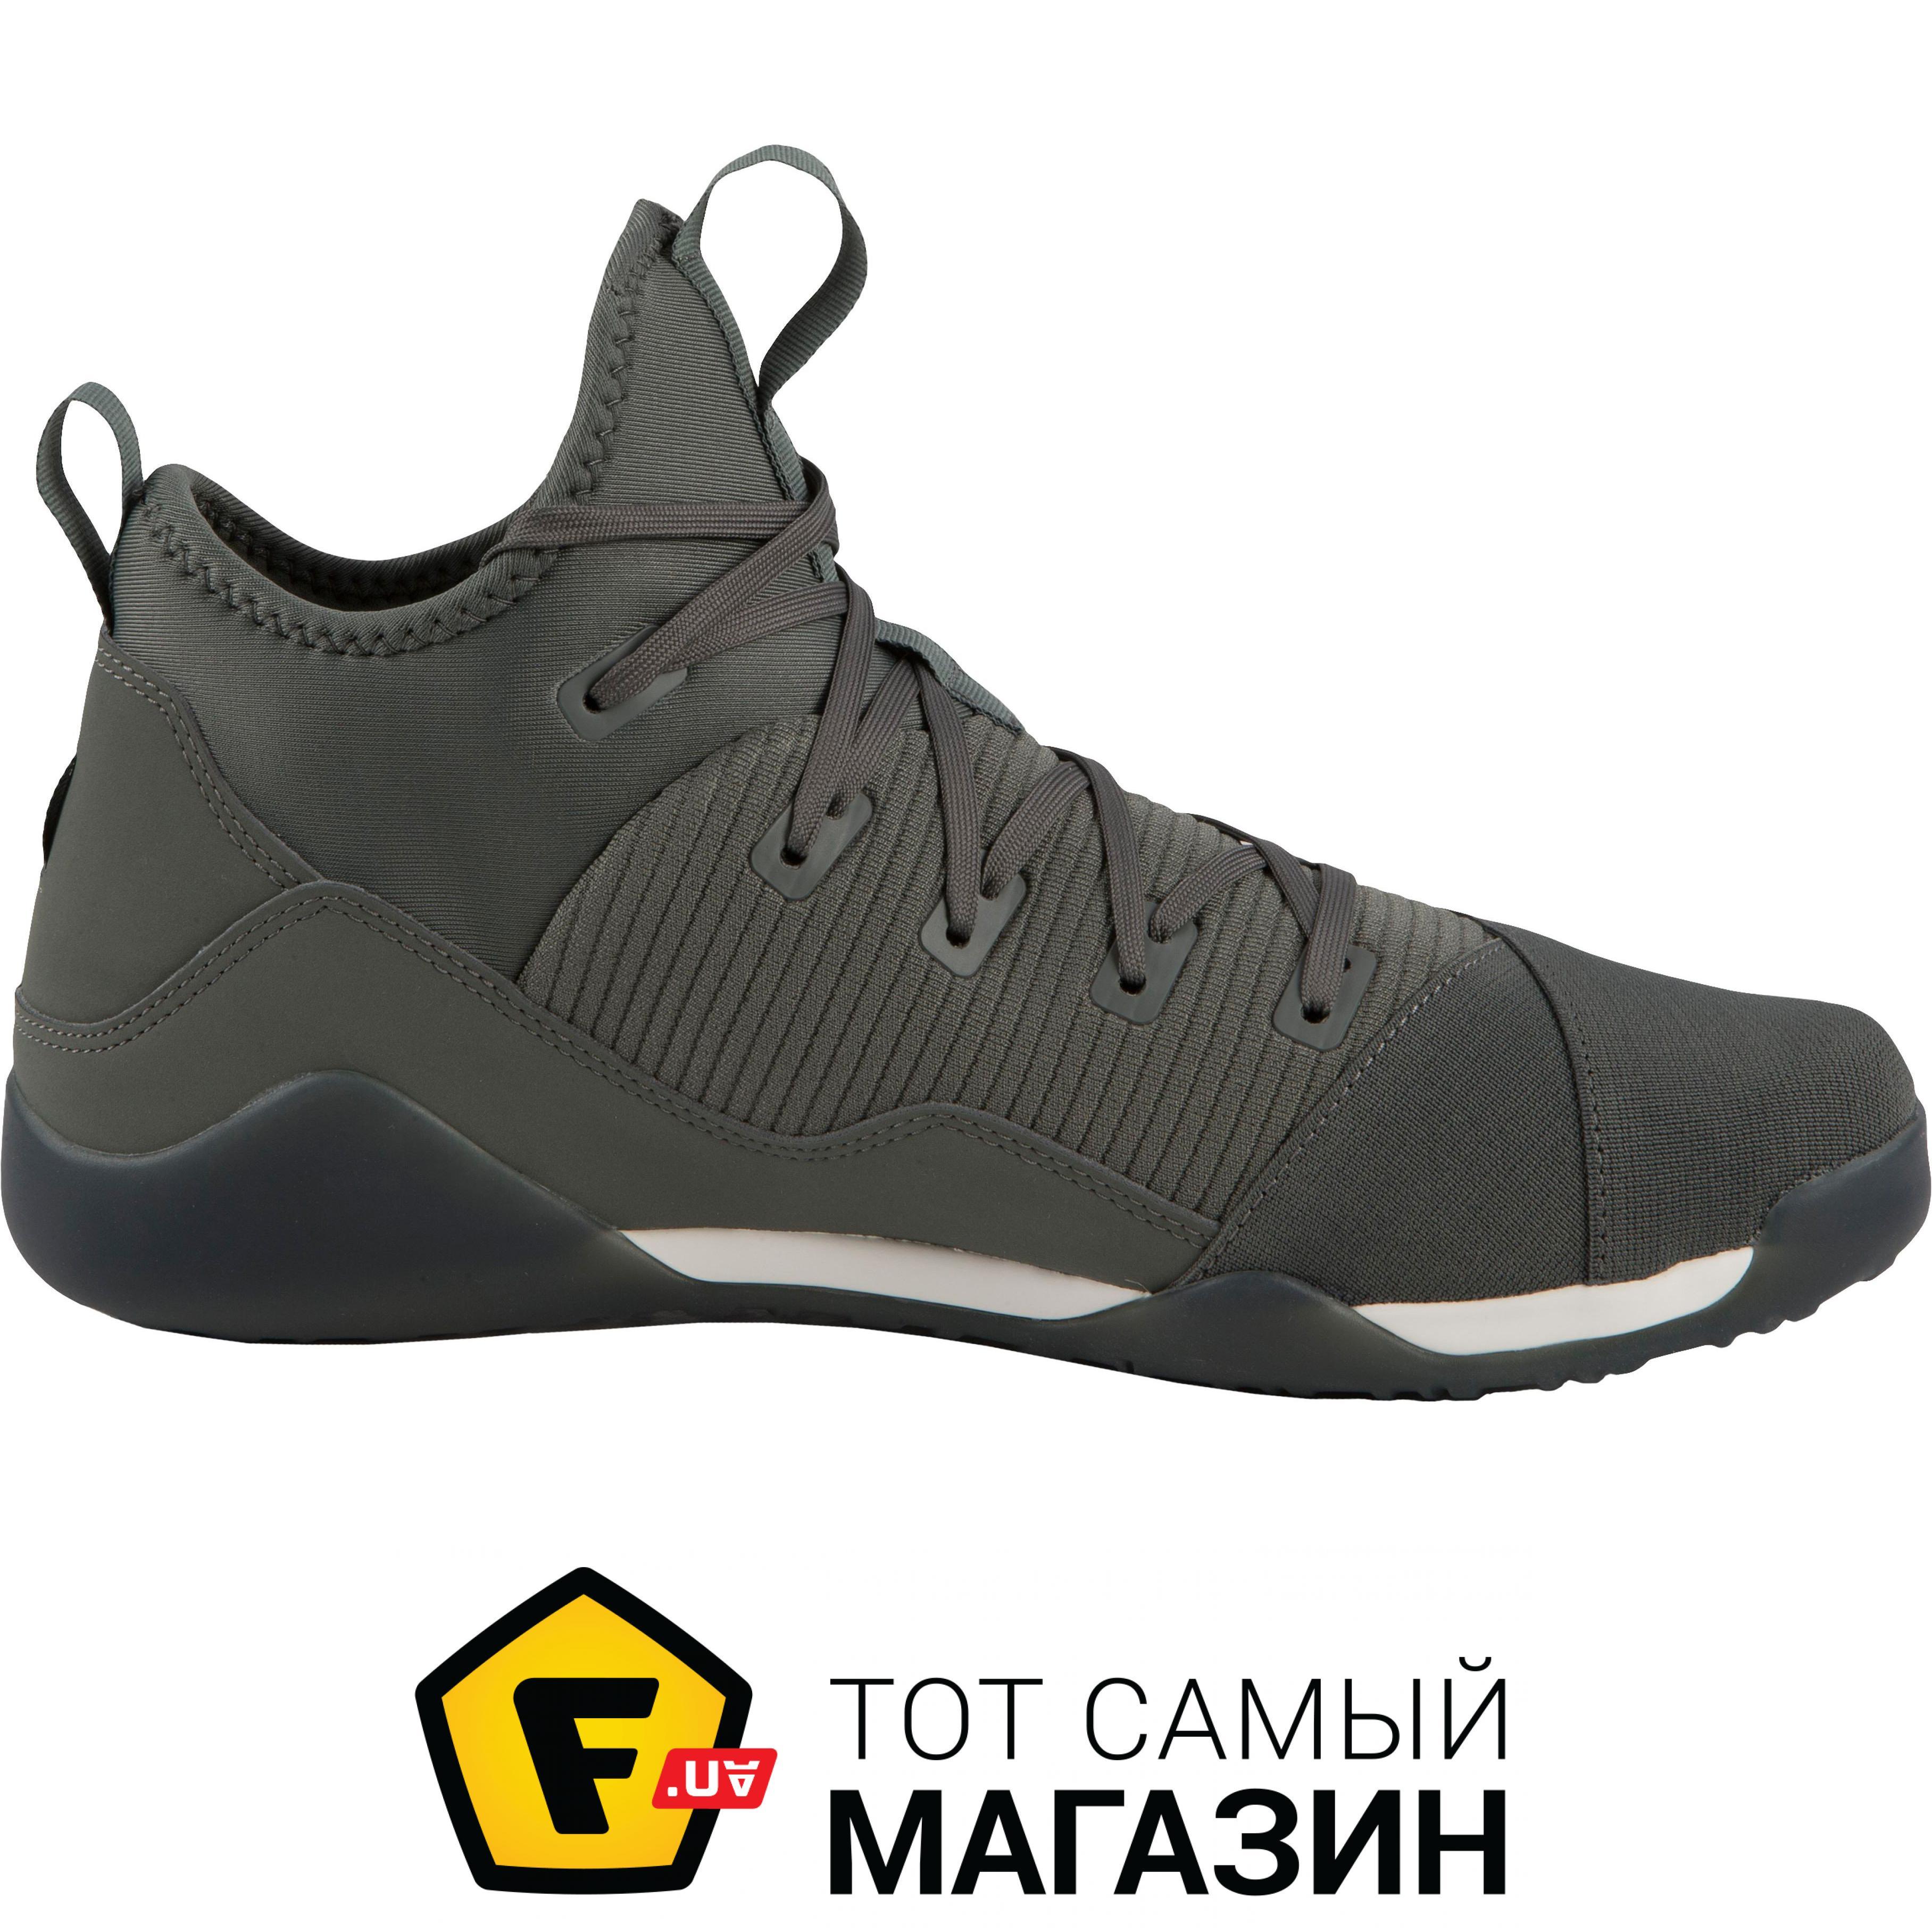 f5fb548dac406a ᐈ REEBOK Combat Noble Mid Boxers 42, серый (REBD2) ~ Купить? ЦЕНА ...